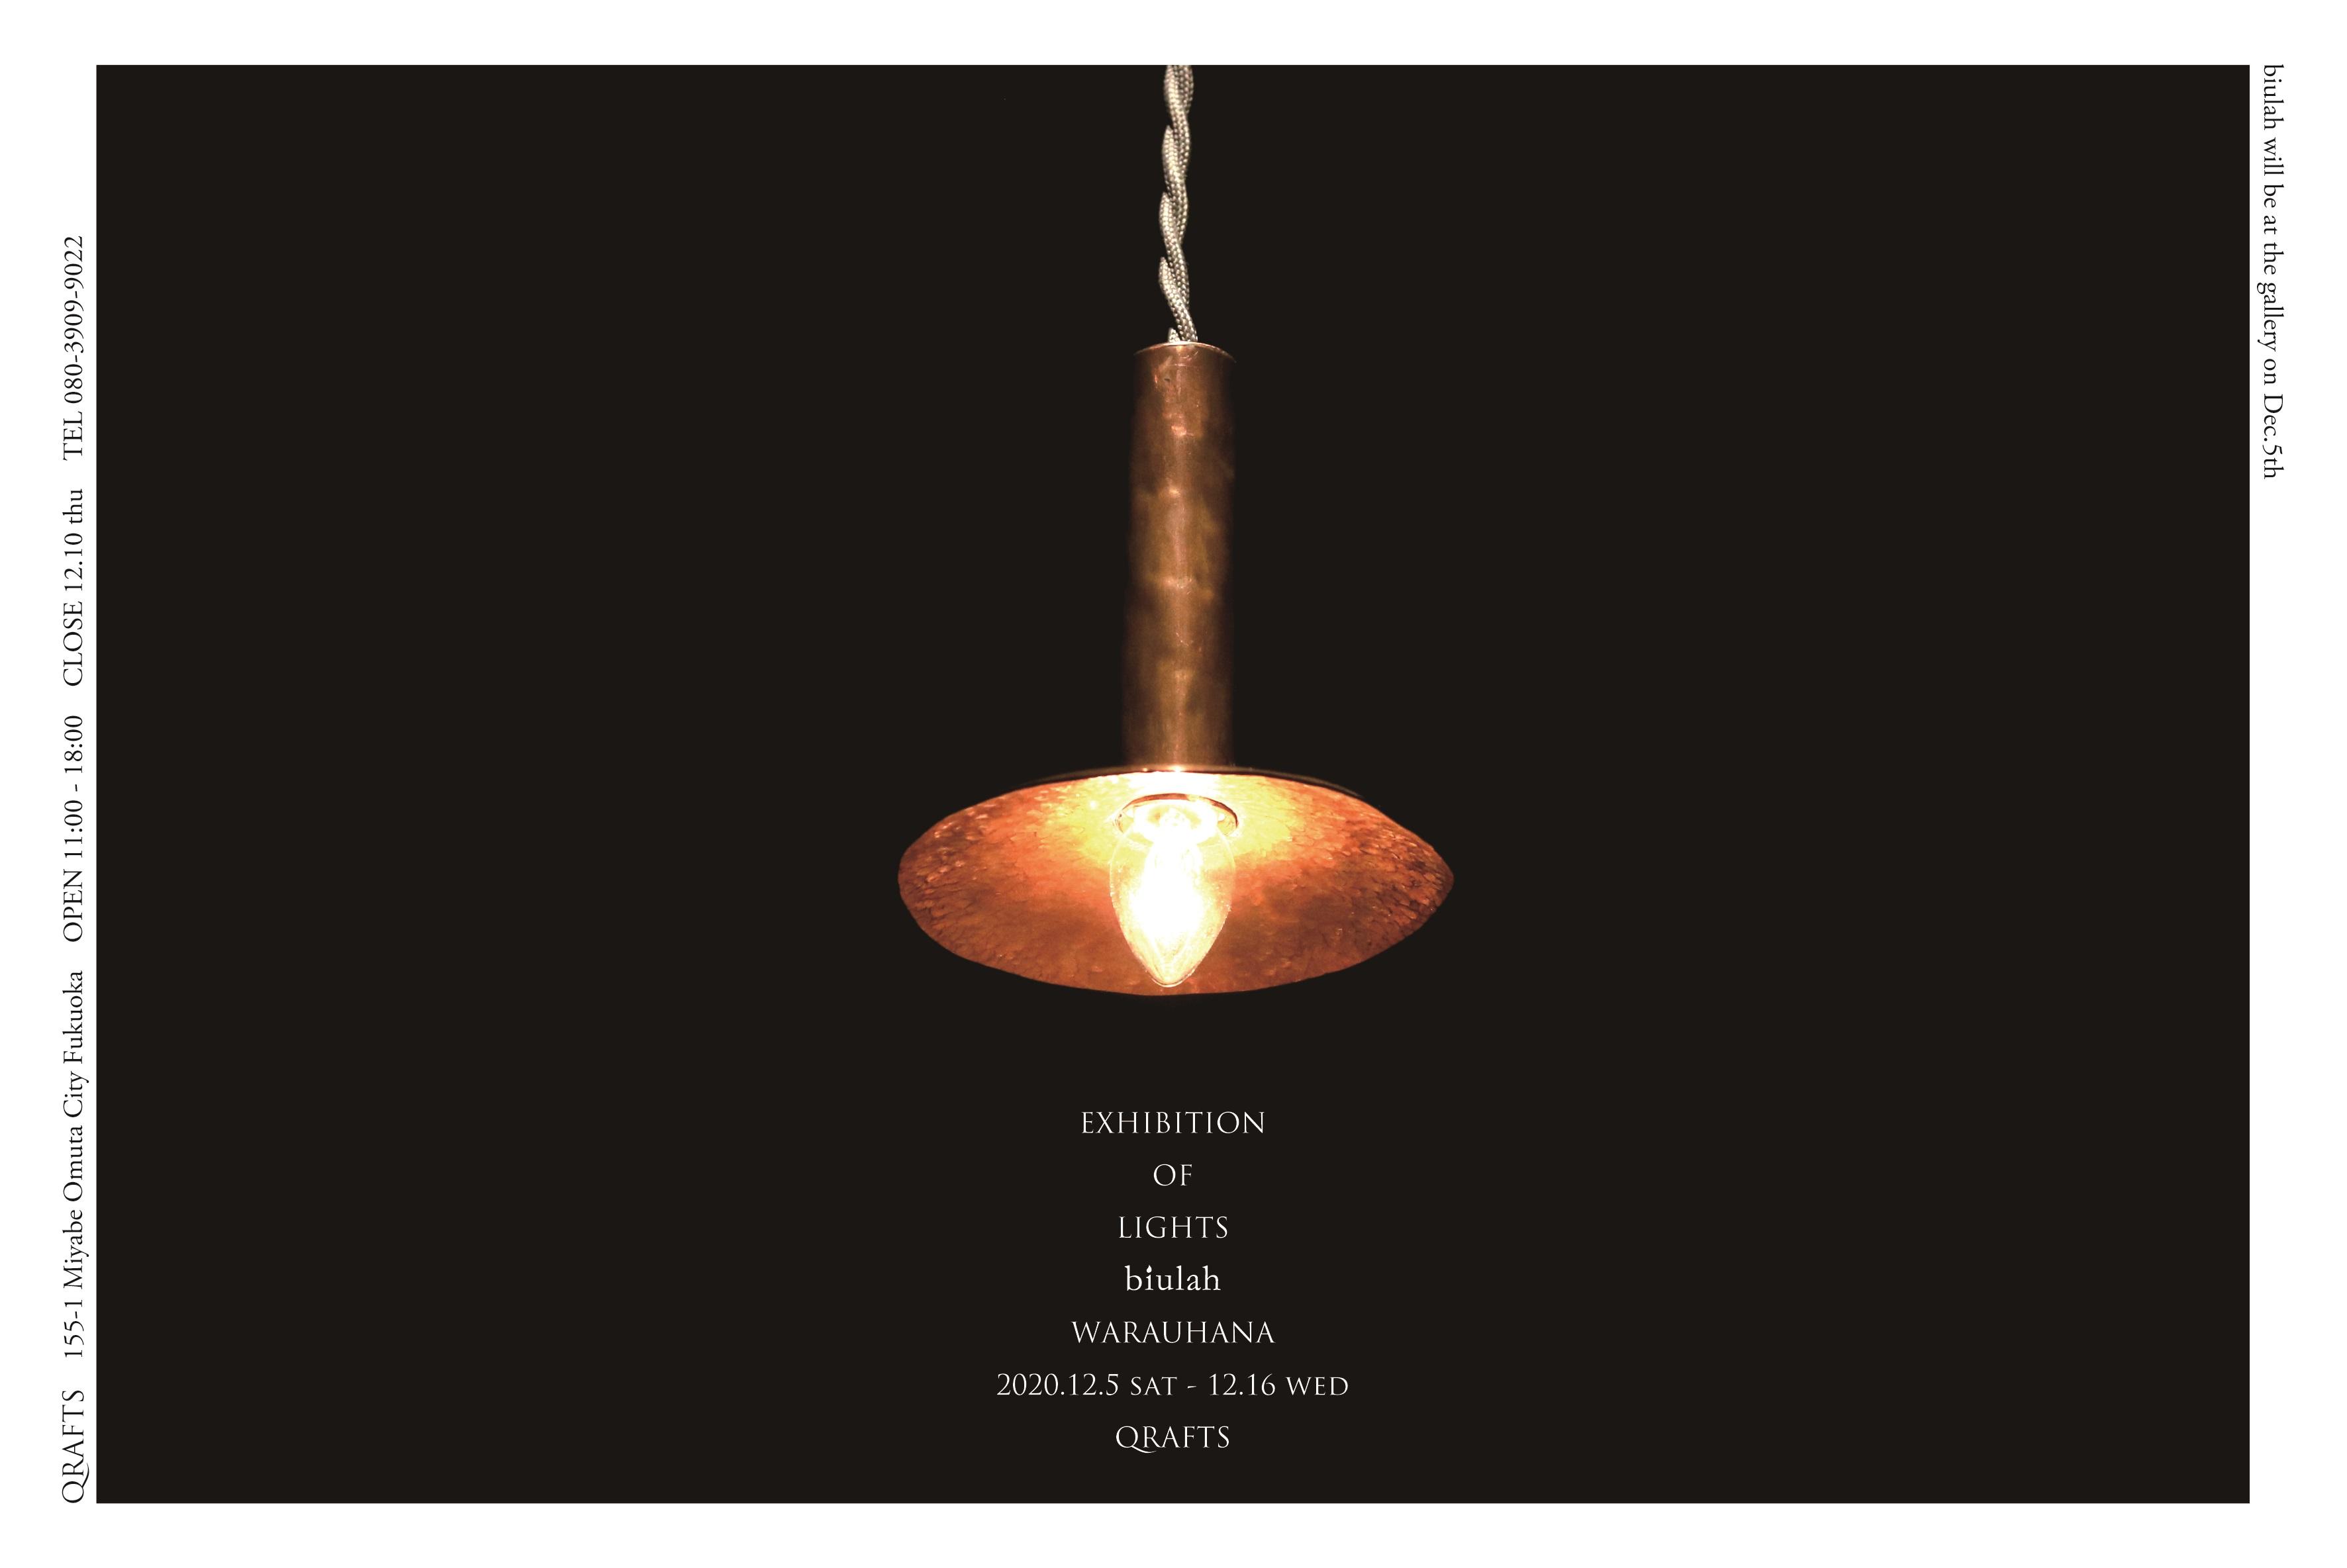 12.5 - 12.16 biulah、WARAUHANA 灯り展開催